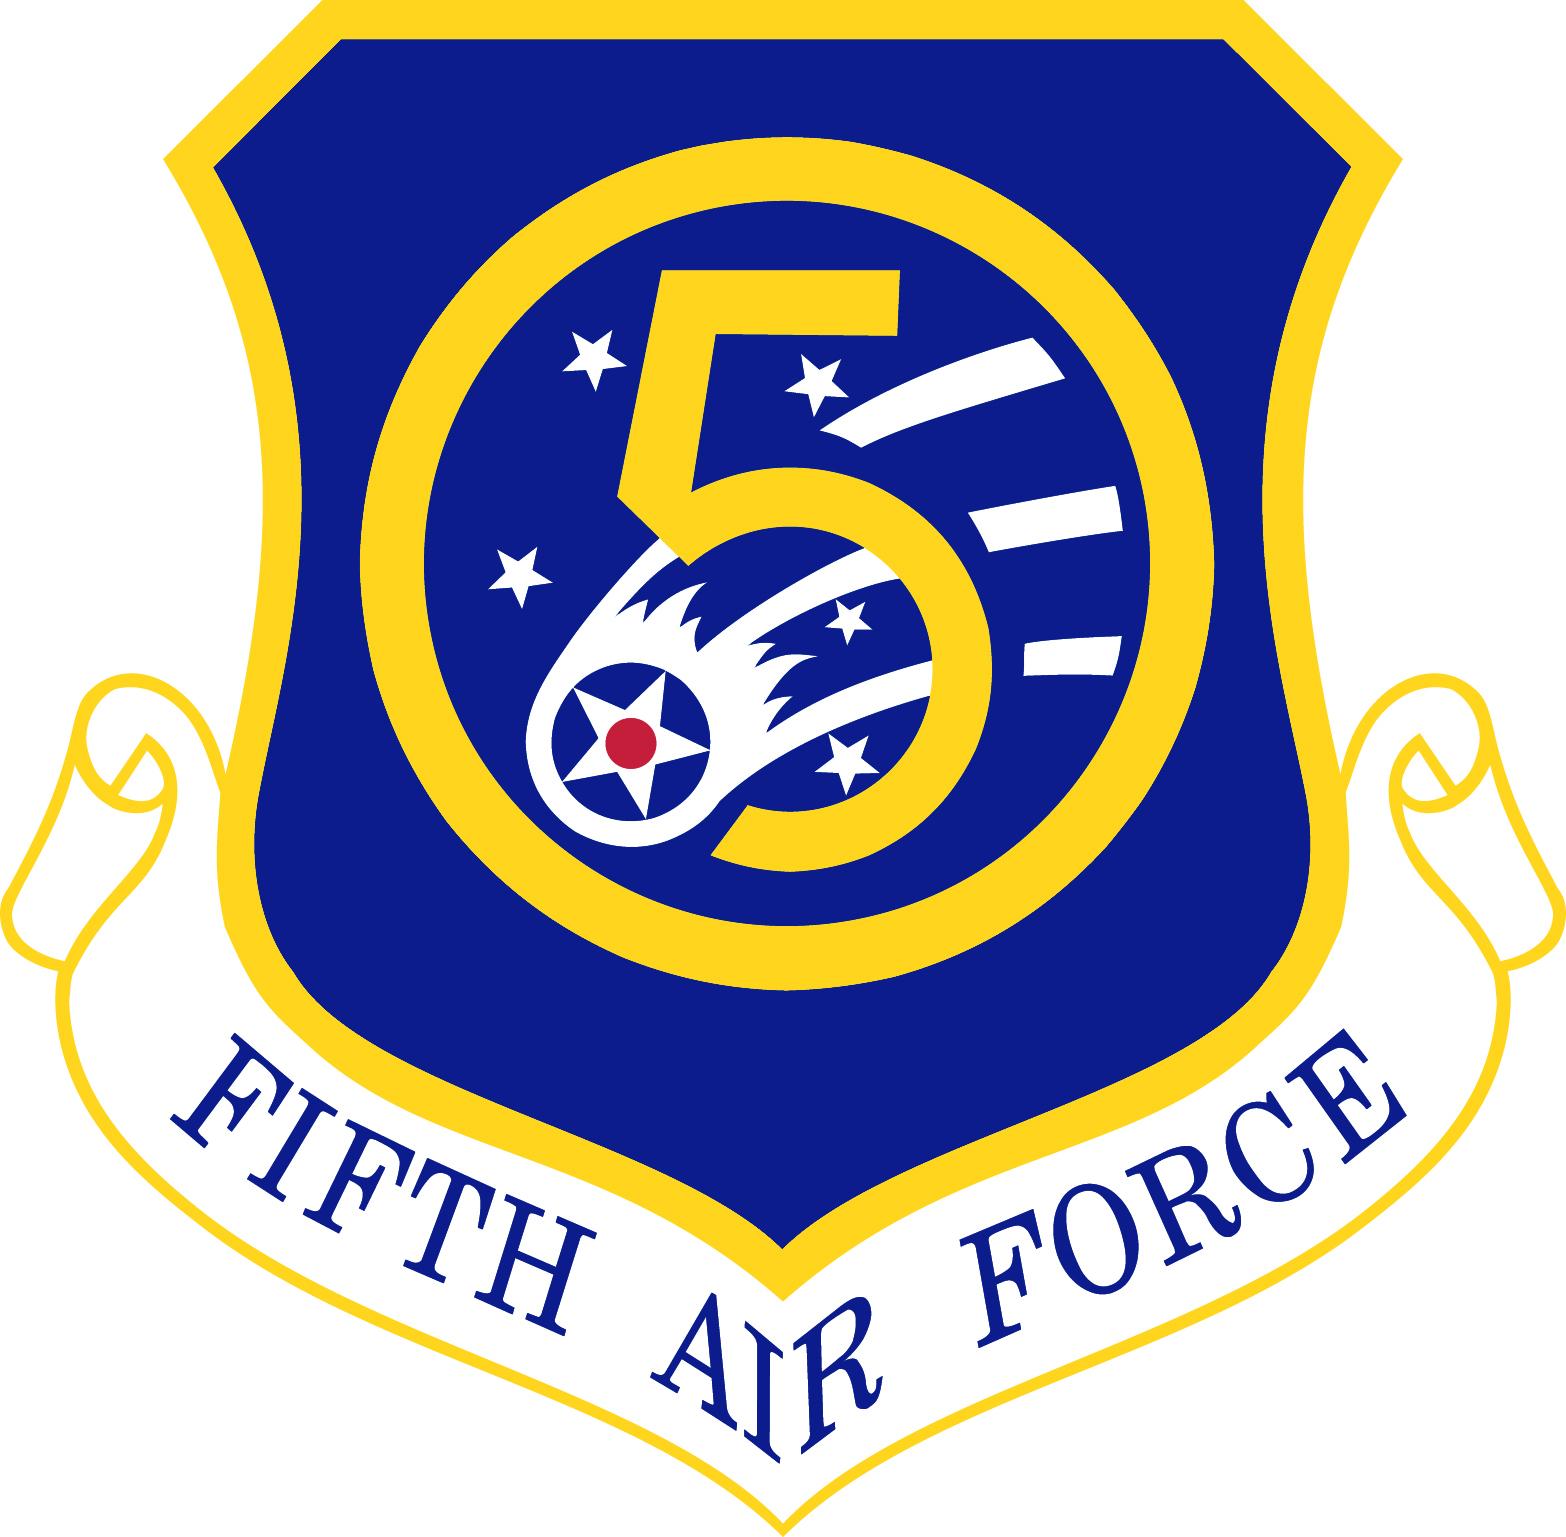 380 th OMS Air Force Uniform Patch Vintage USAF U.S